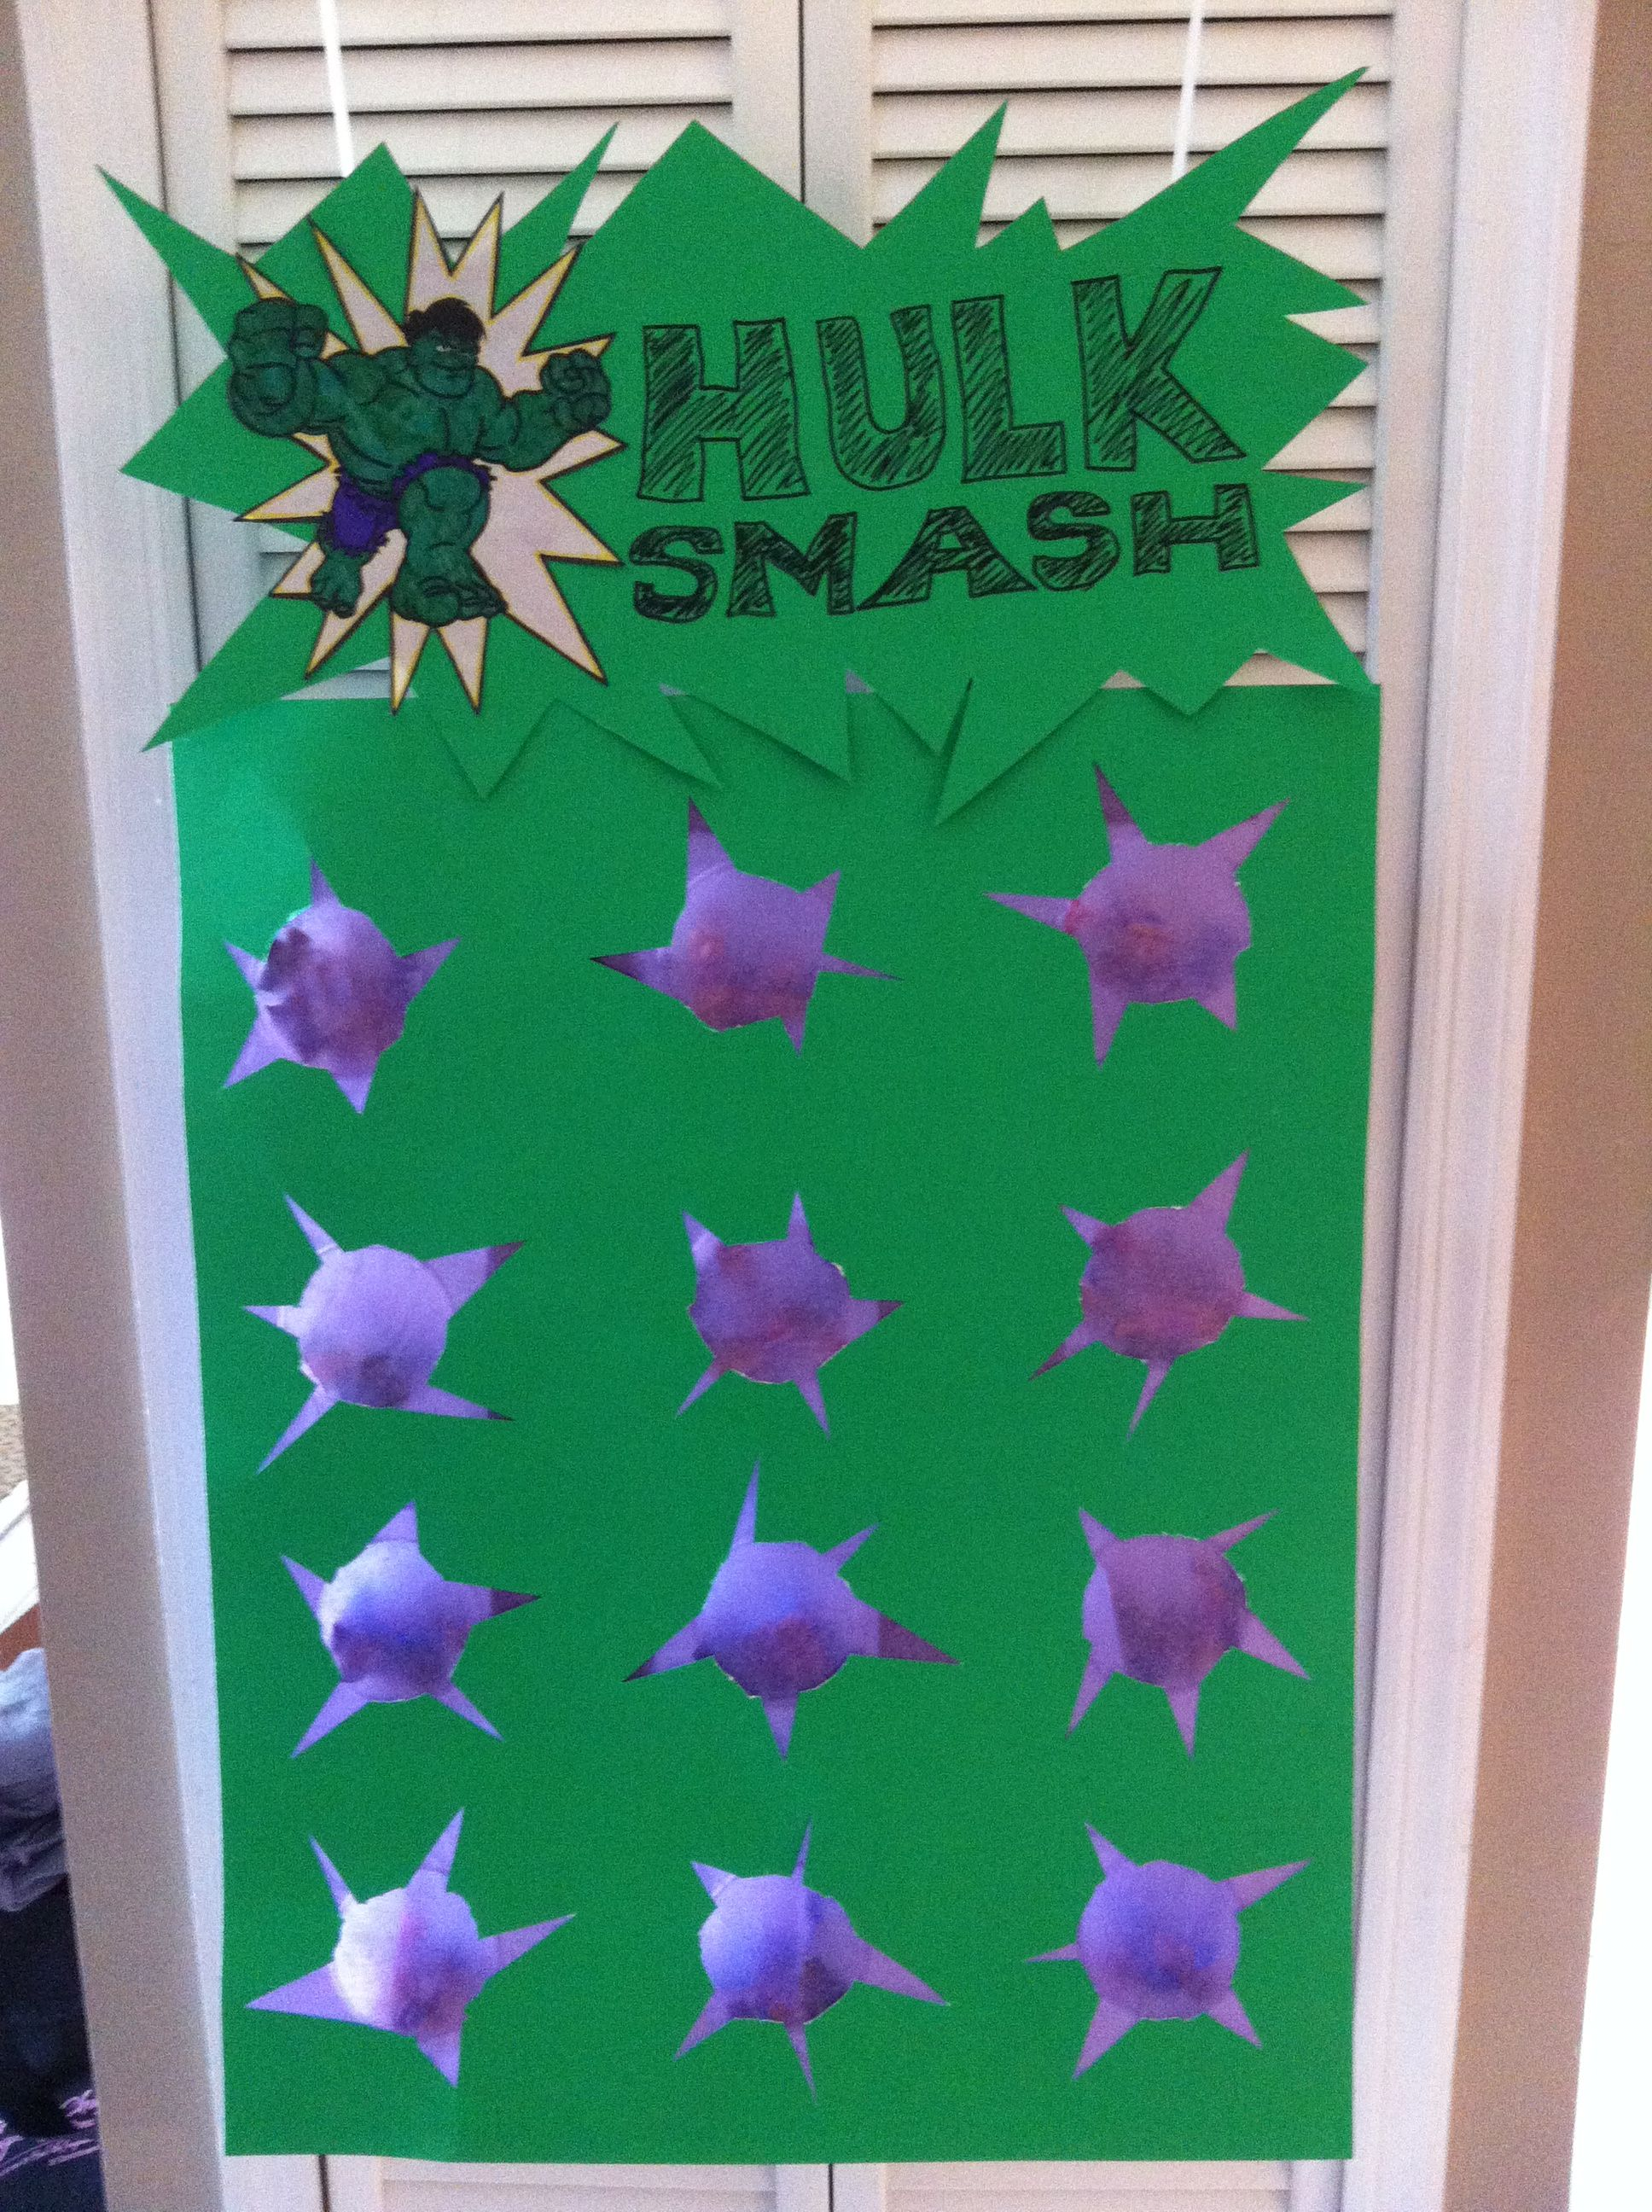 Pin By Janie Padua On Jaeden S 2nd Birthday Party Marvel Birthday Party Hulk Birthday Parties Avenger Birthday Party